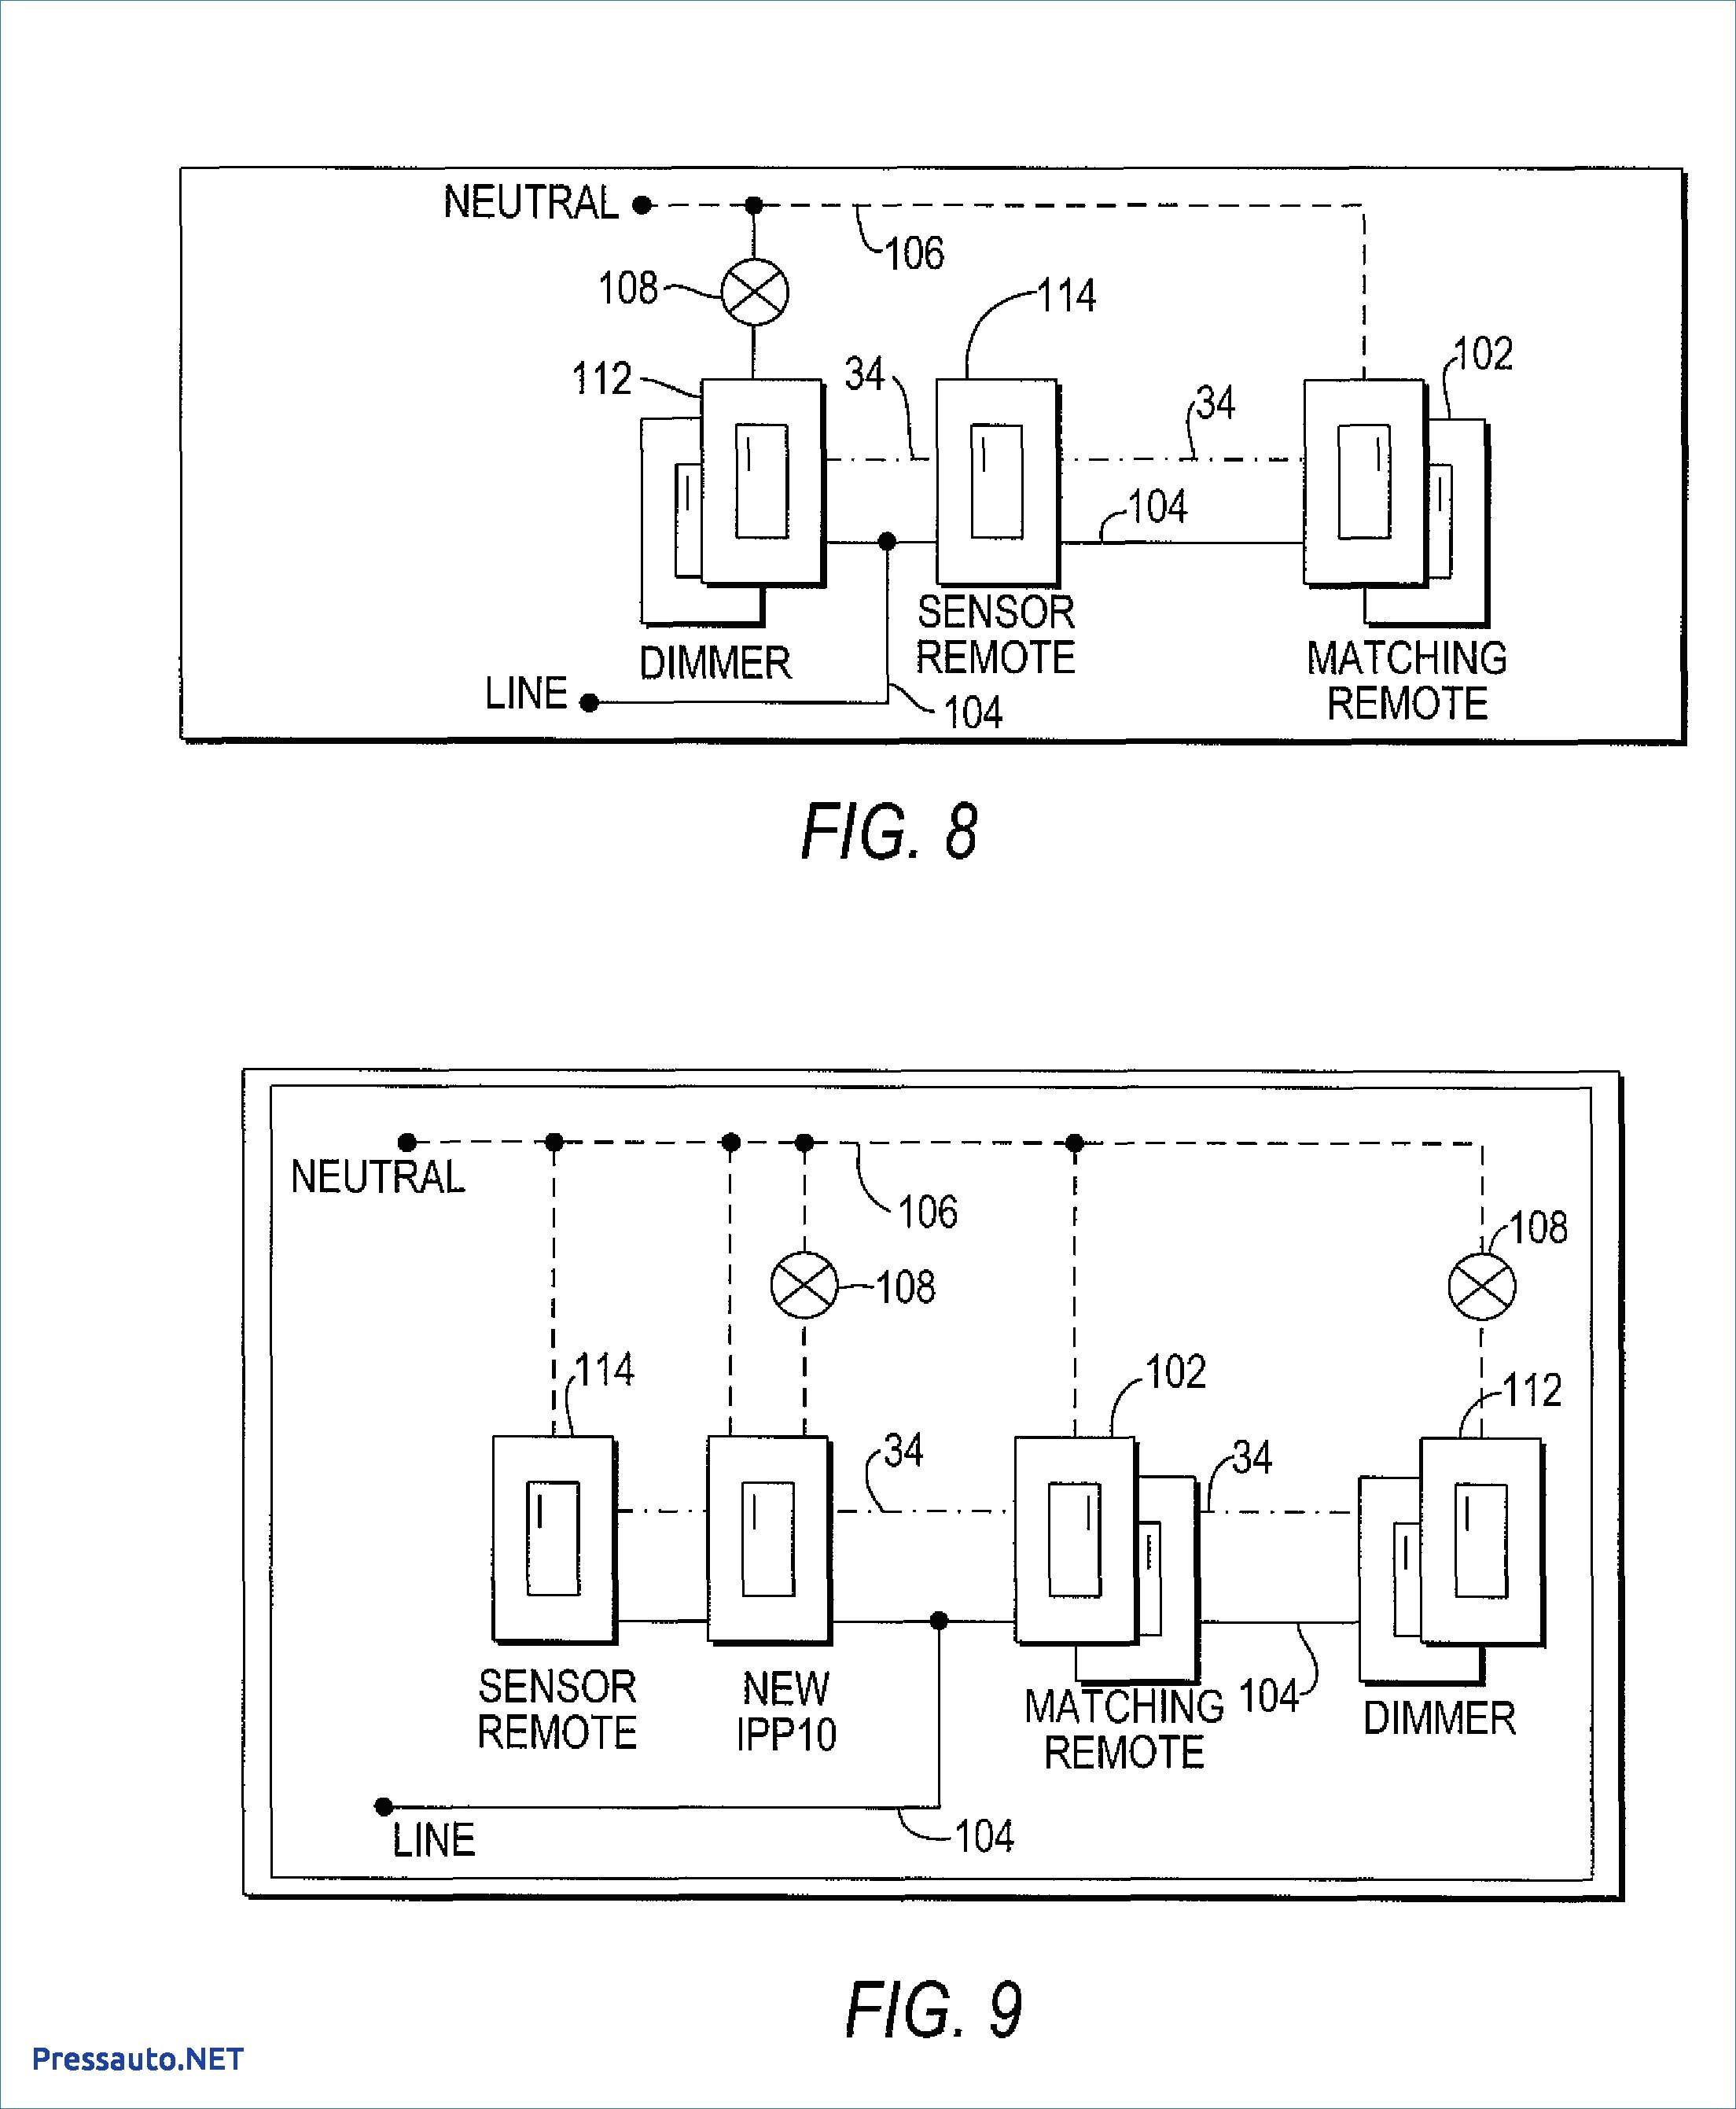 Lutron nova t dimmer wiring diagram custom wiring diagram lutron 0 10v dimmer wiring diagram circuit wiring and diagram hub u2022 rh bdnewsmix com lutron dimmer switch lutron 4 way dimmer switch cheapraybanclubmaster Choice Image